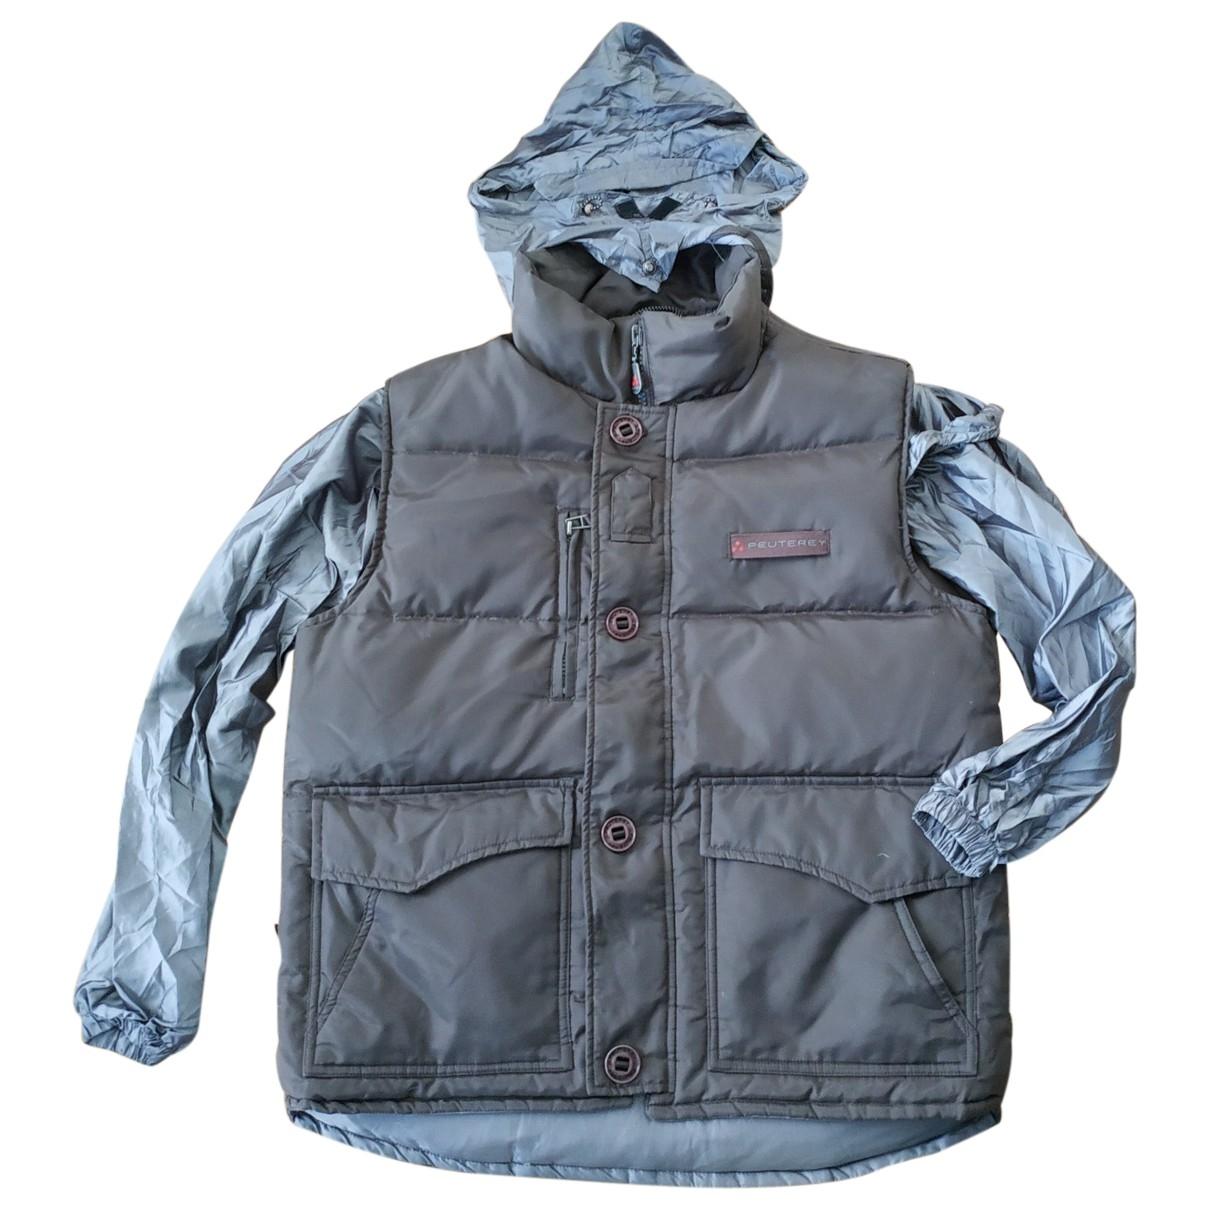 Peuterey \N Brown jacket  for Men M International